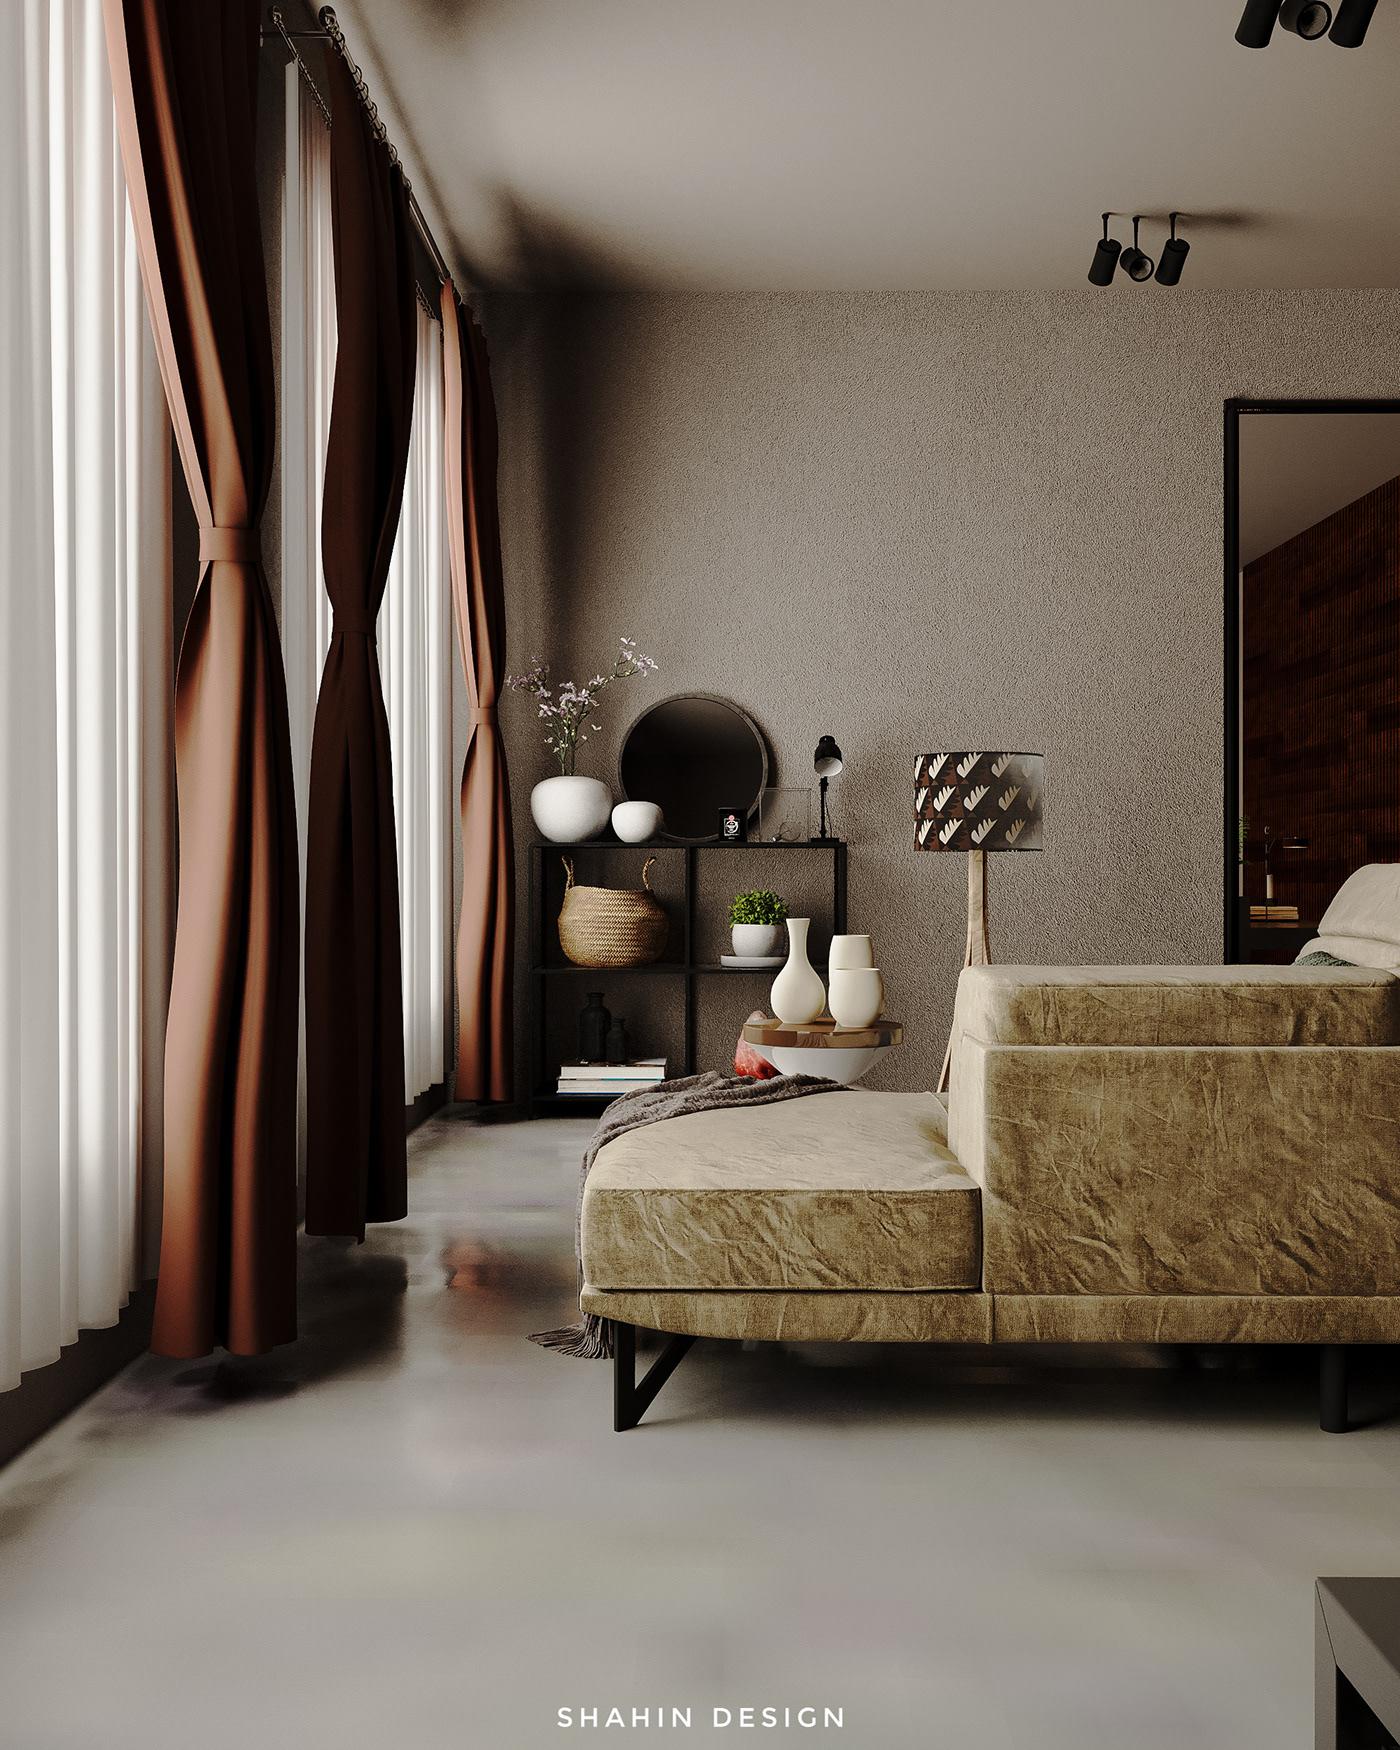 3ds max architect archviz bedroom design cg artist CGI corona render  interior designer modern bedroom visualization